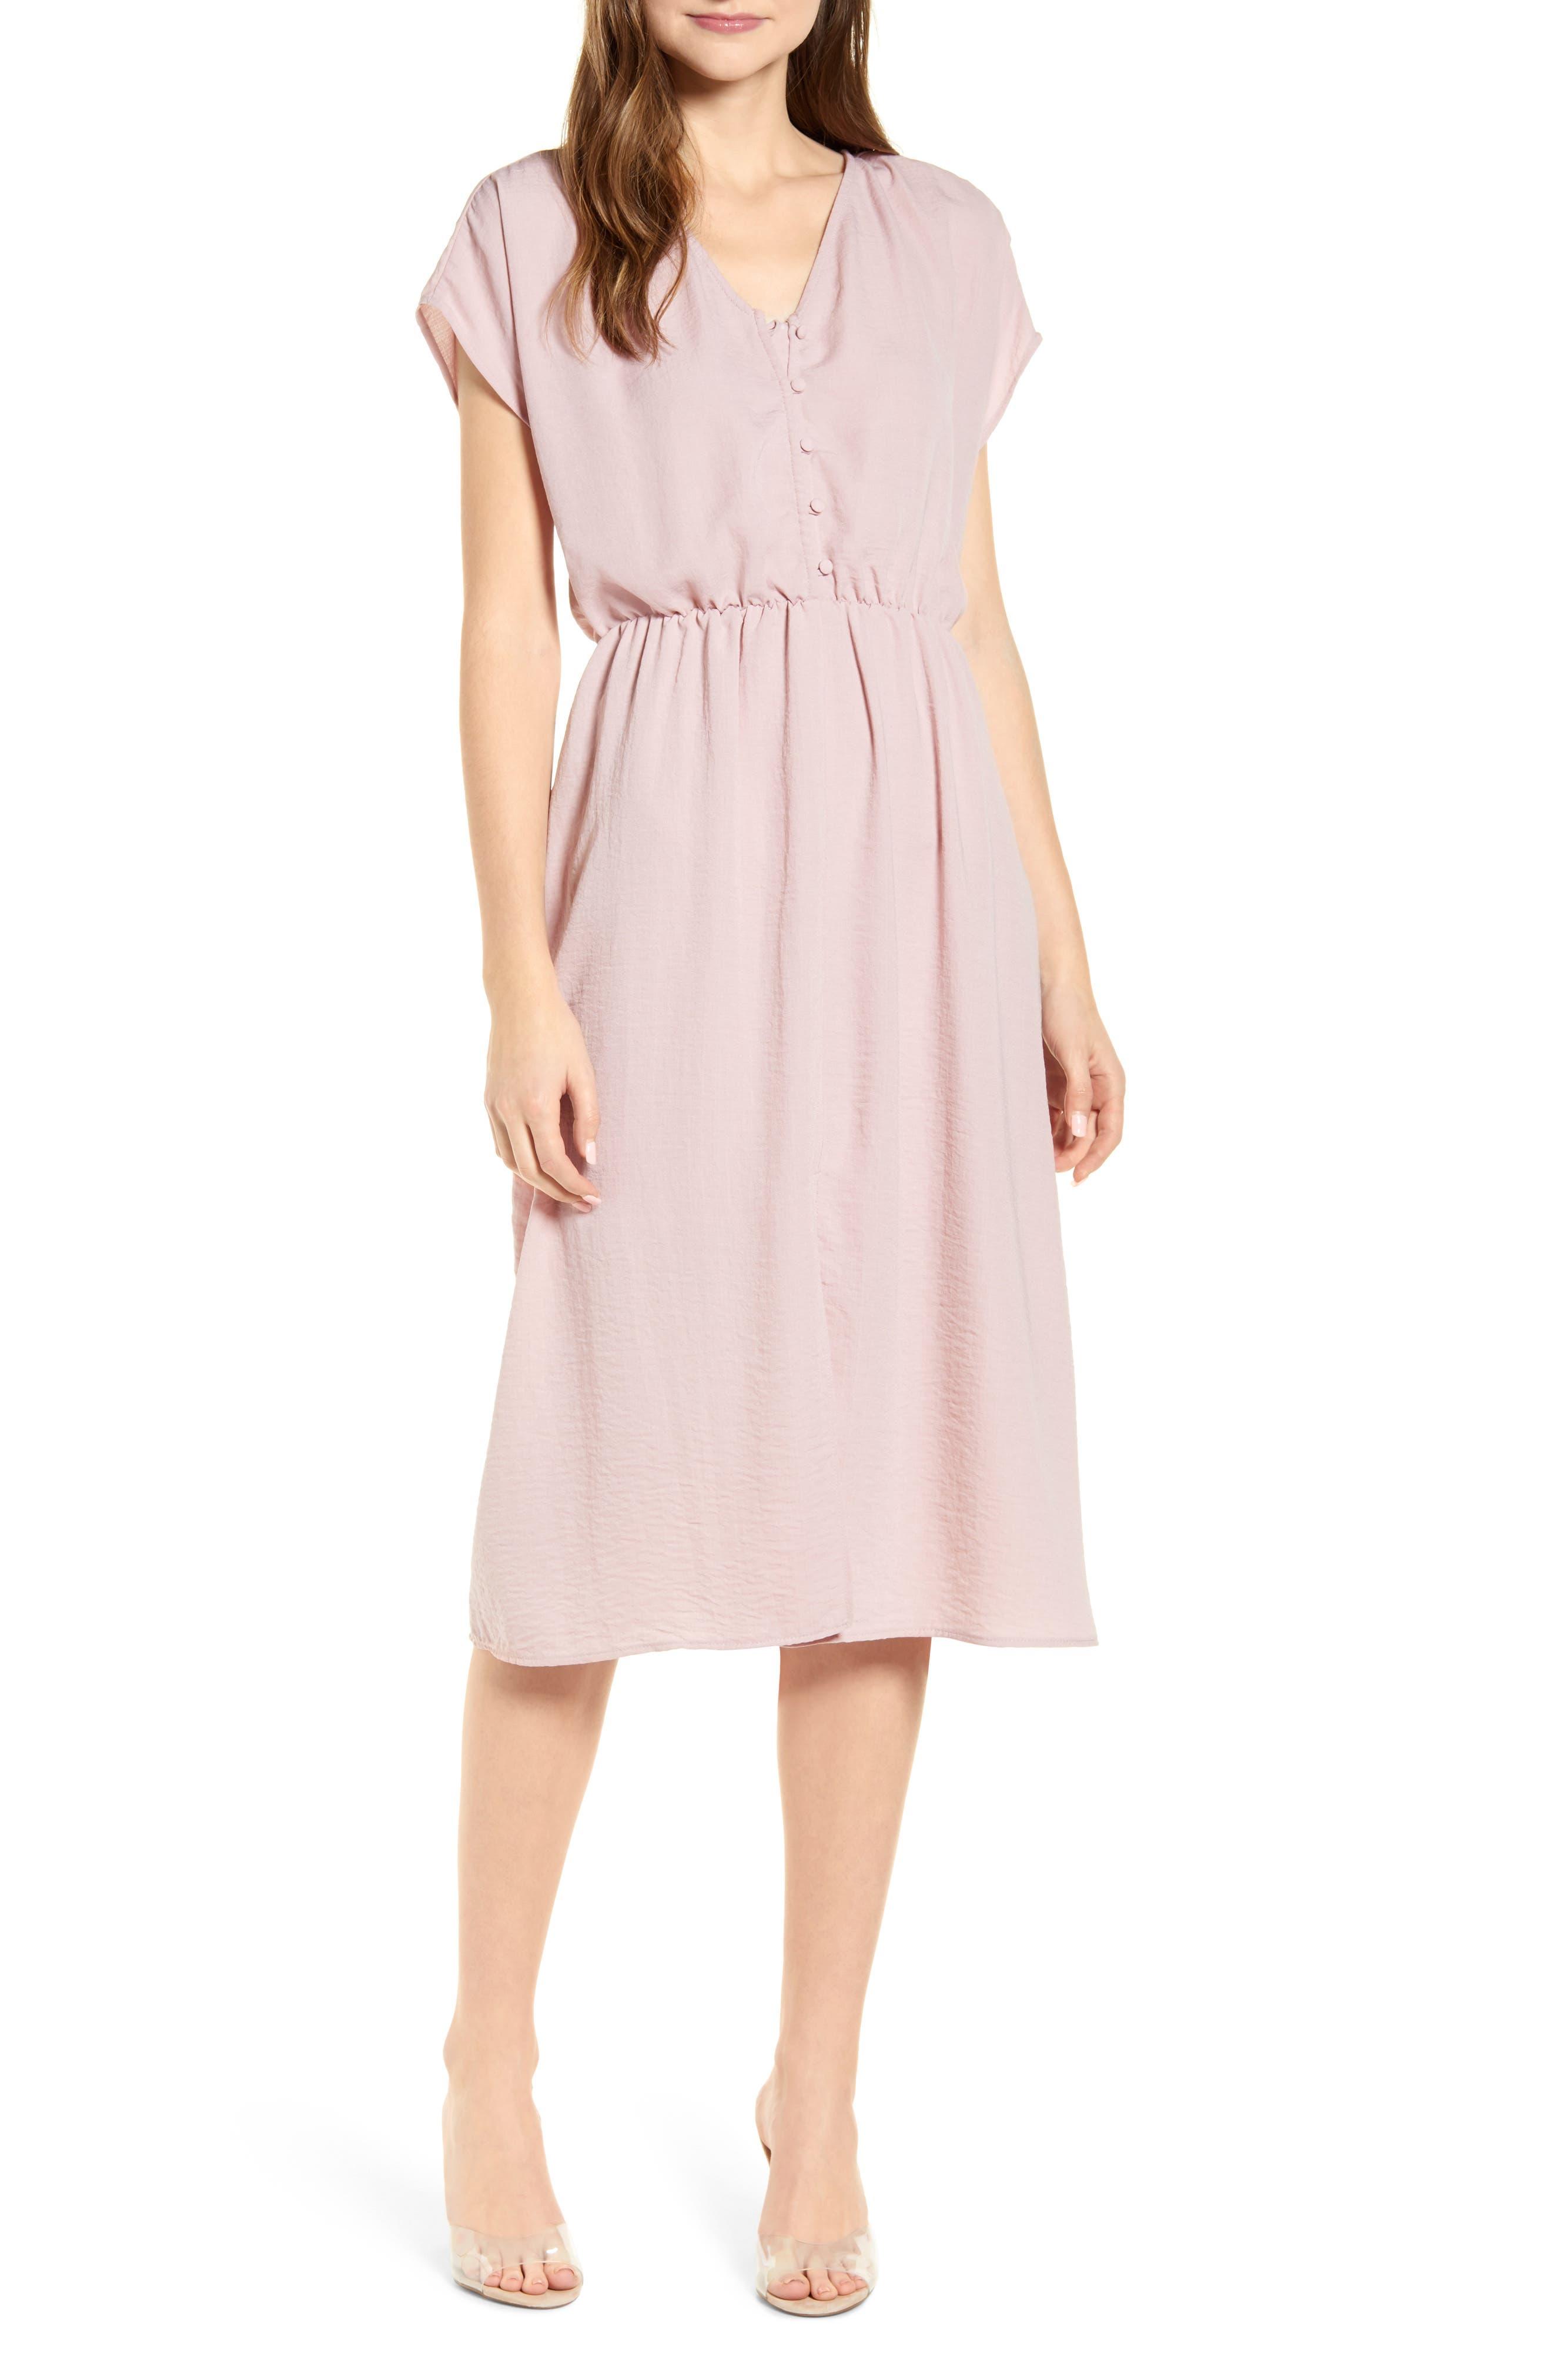 Dolman Sleeve A-Line Dress